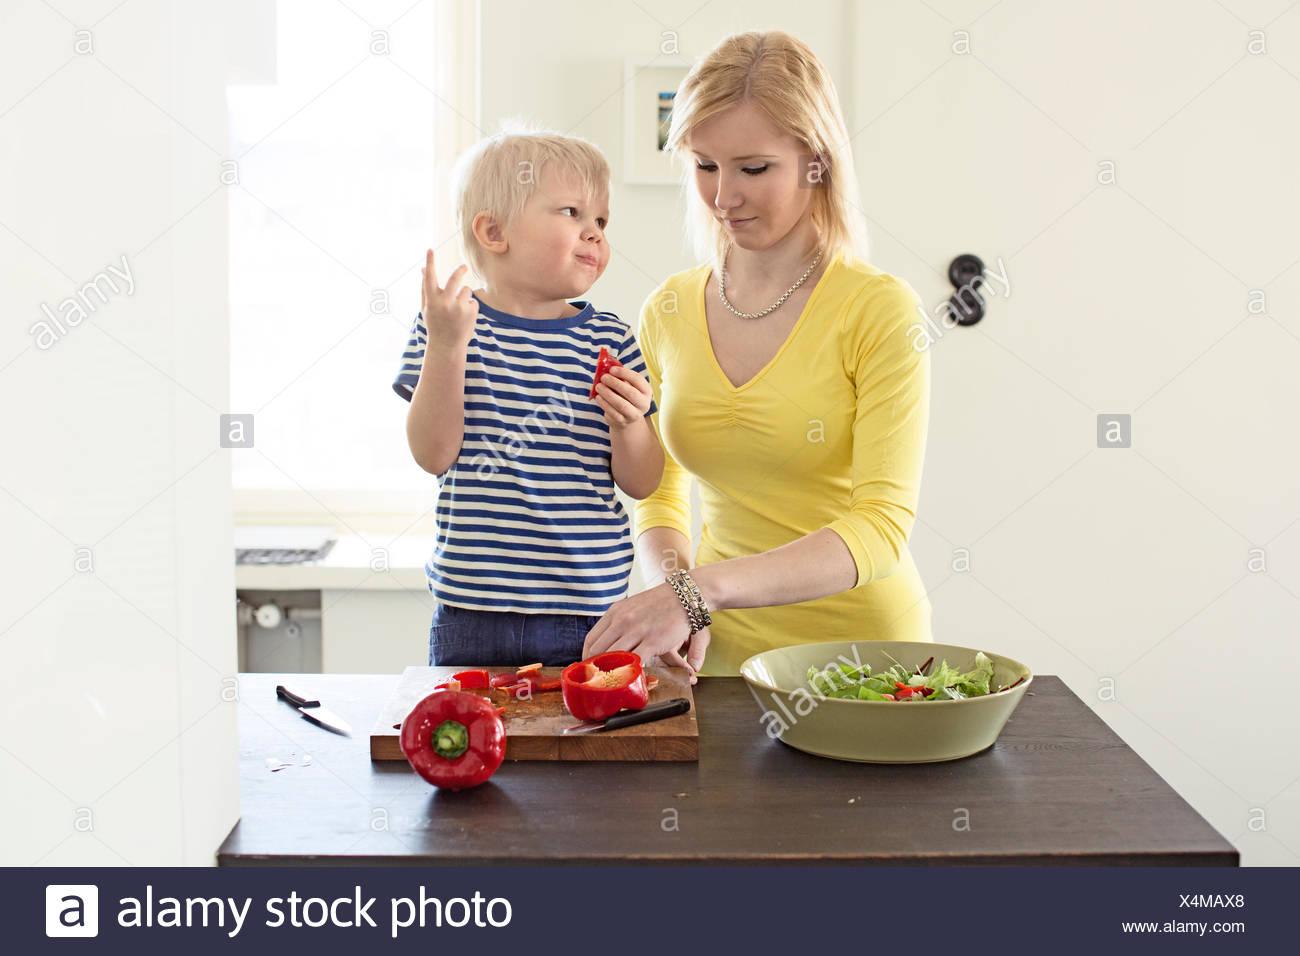 Finland, Helsinki, Kallio, Mother and son making salad in kitchen - Stock Image